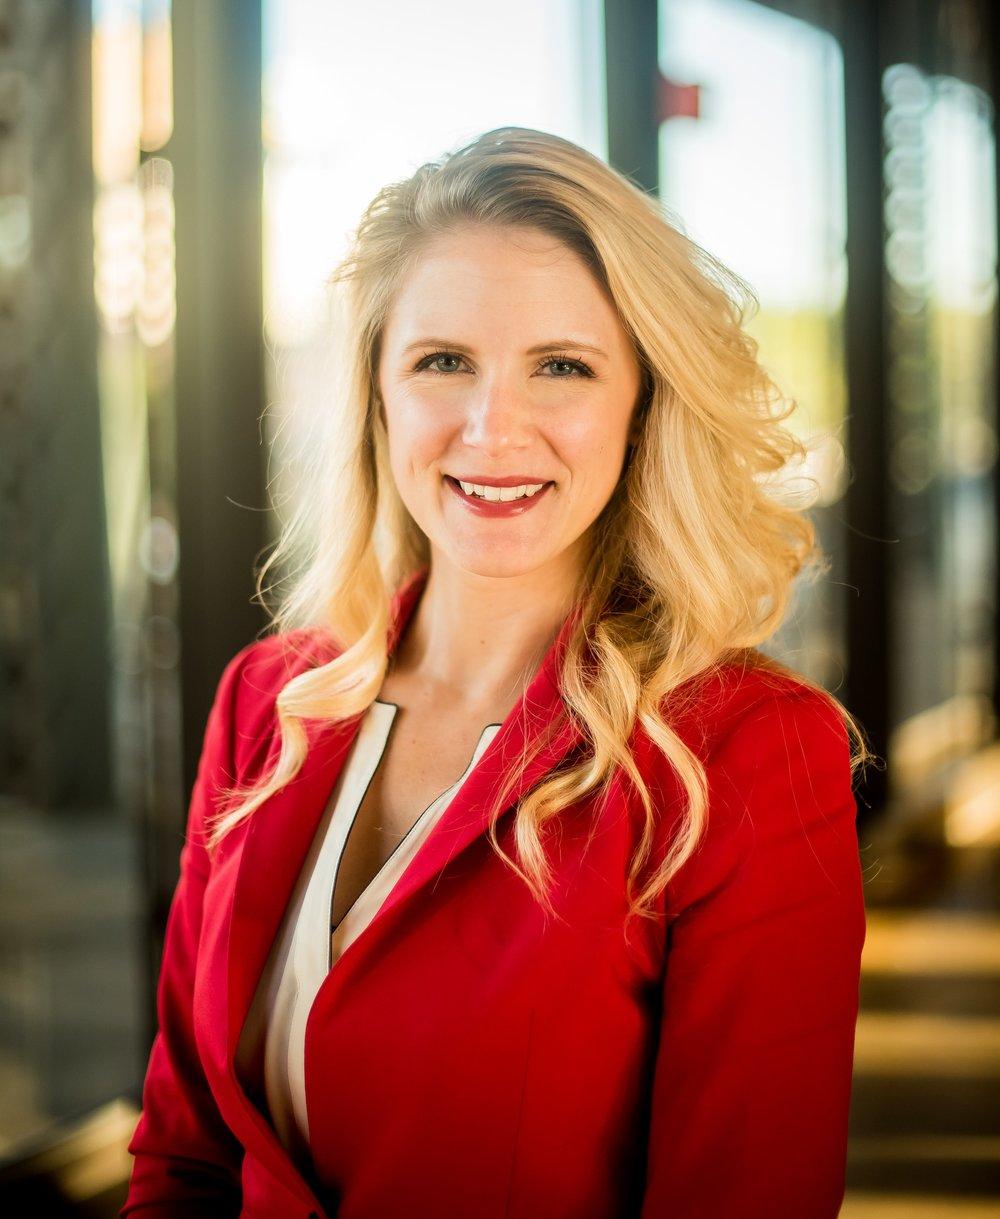 Julianne Akins, executive director